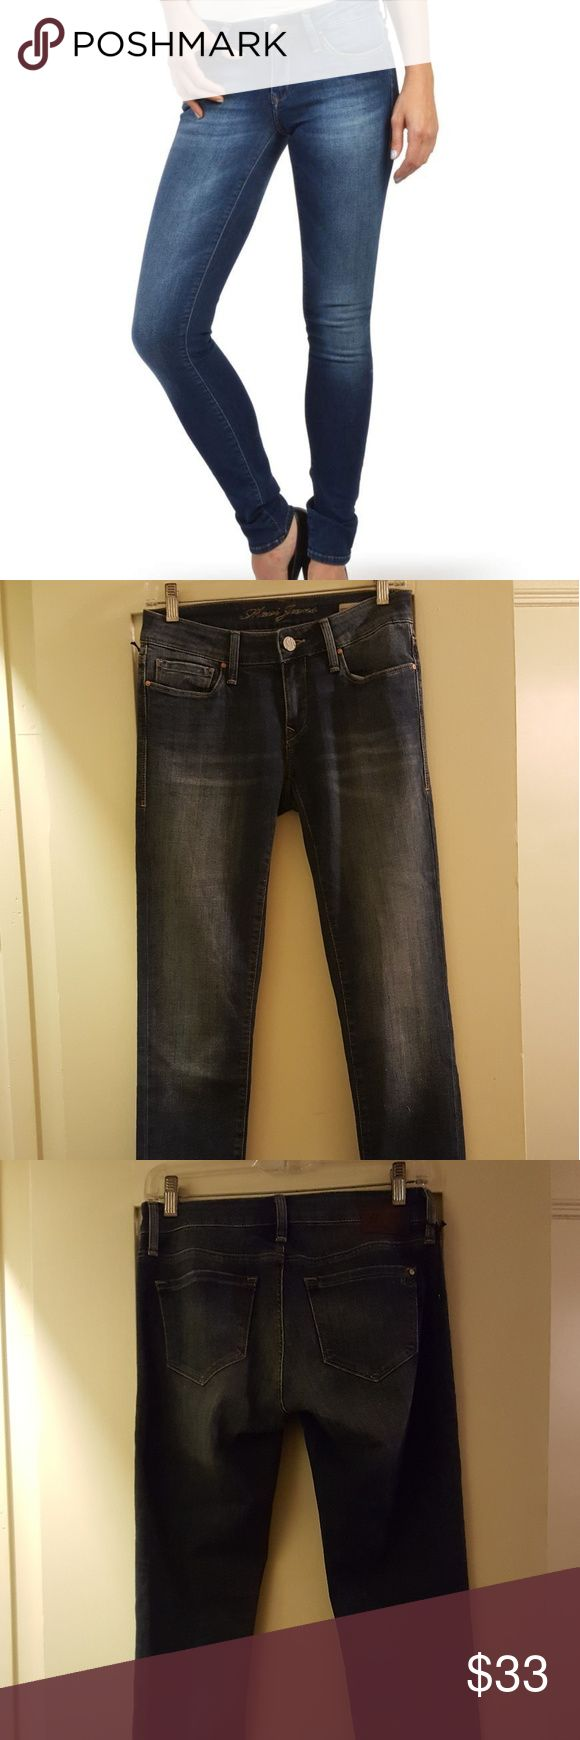 Mavi Jeans Serena Super Skinny size 27 New without tags. Mavi Jeans Serena low rise, super skinny jeans. Size 27. Medium wash. Mavi Jeans Skinny